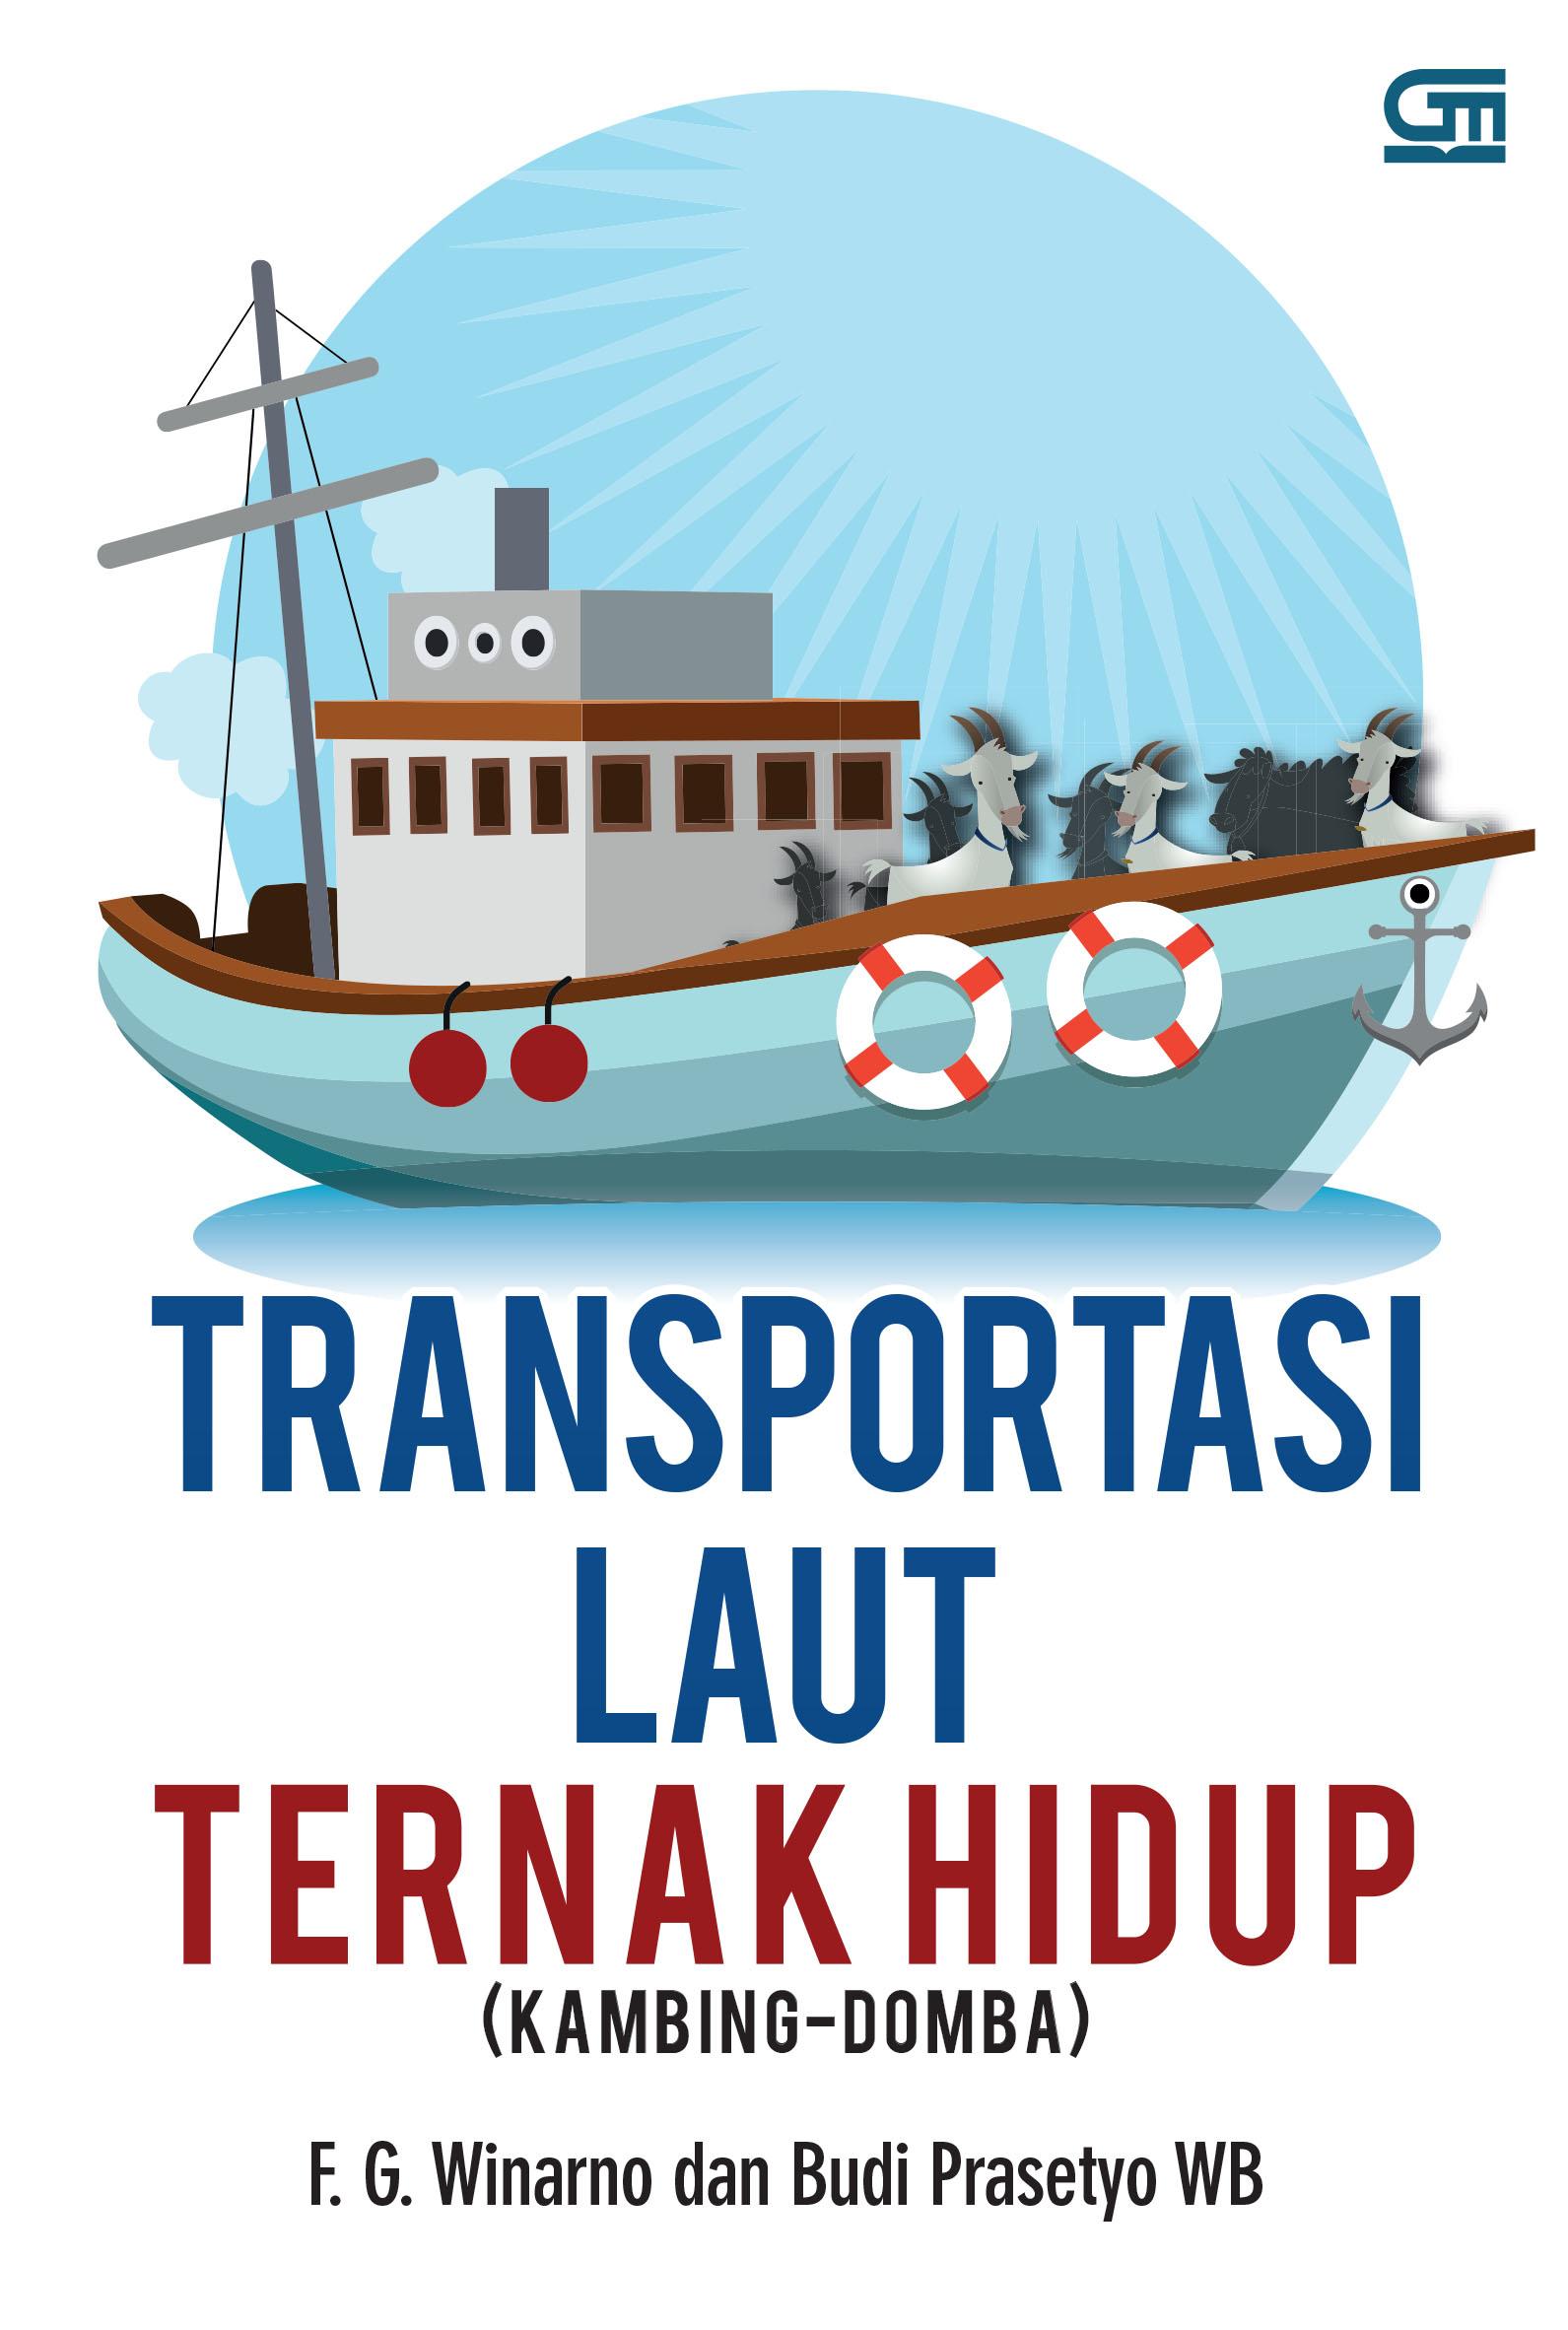 Transportasi Laut Ternak Hidup (Kambing-Domba)